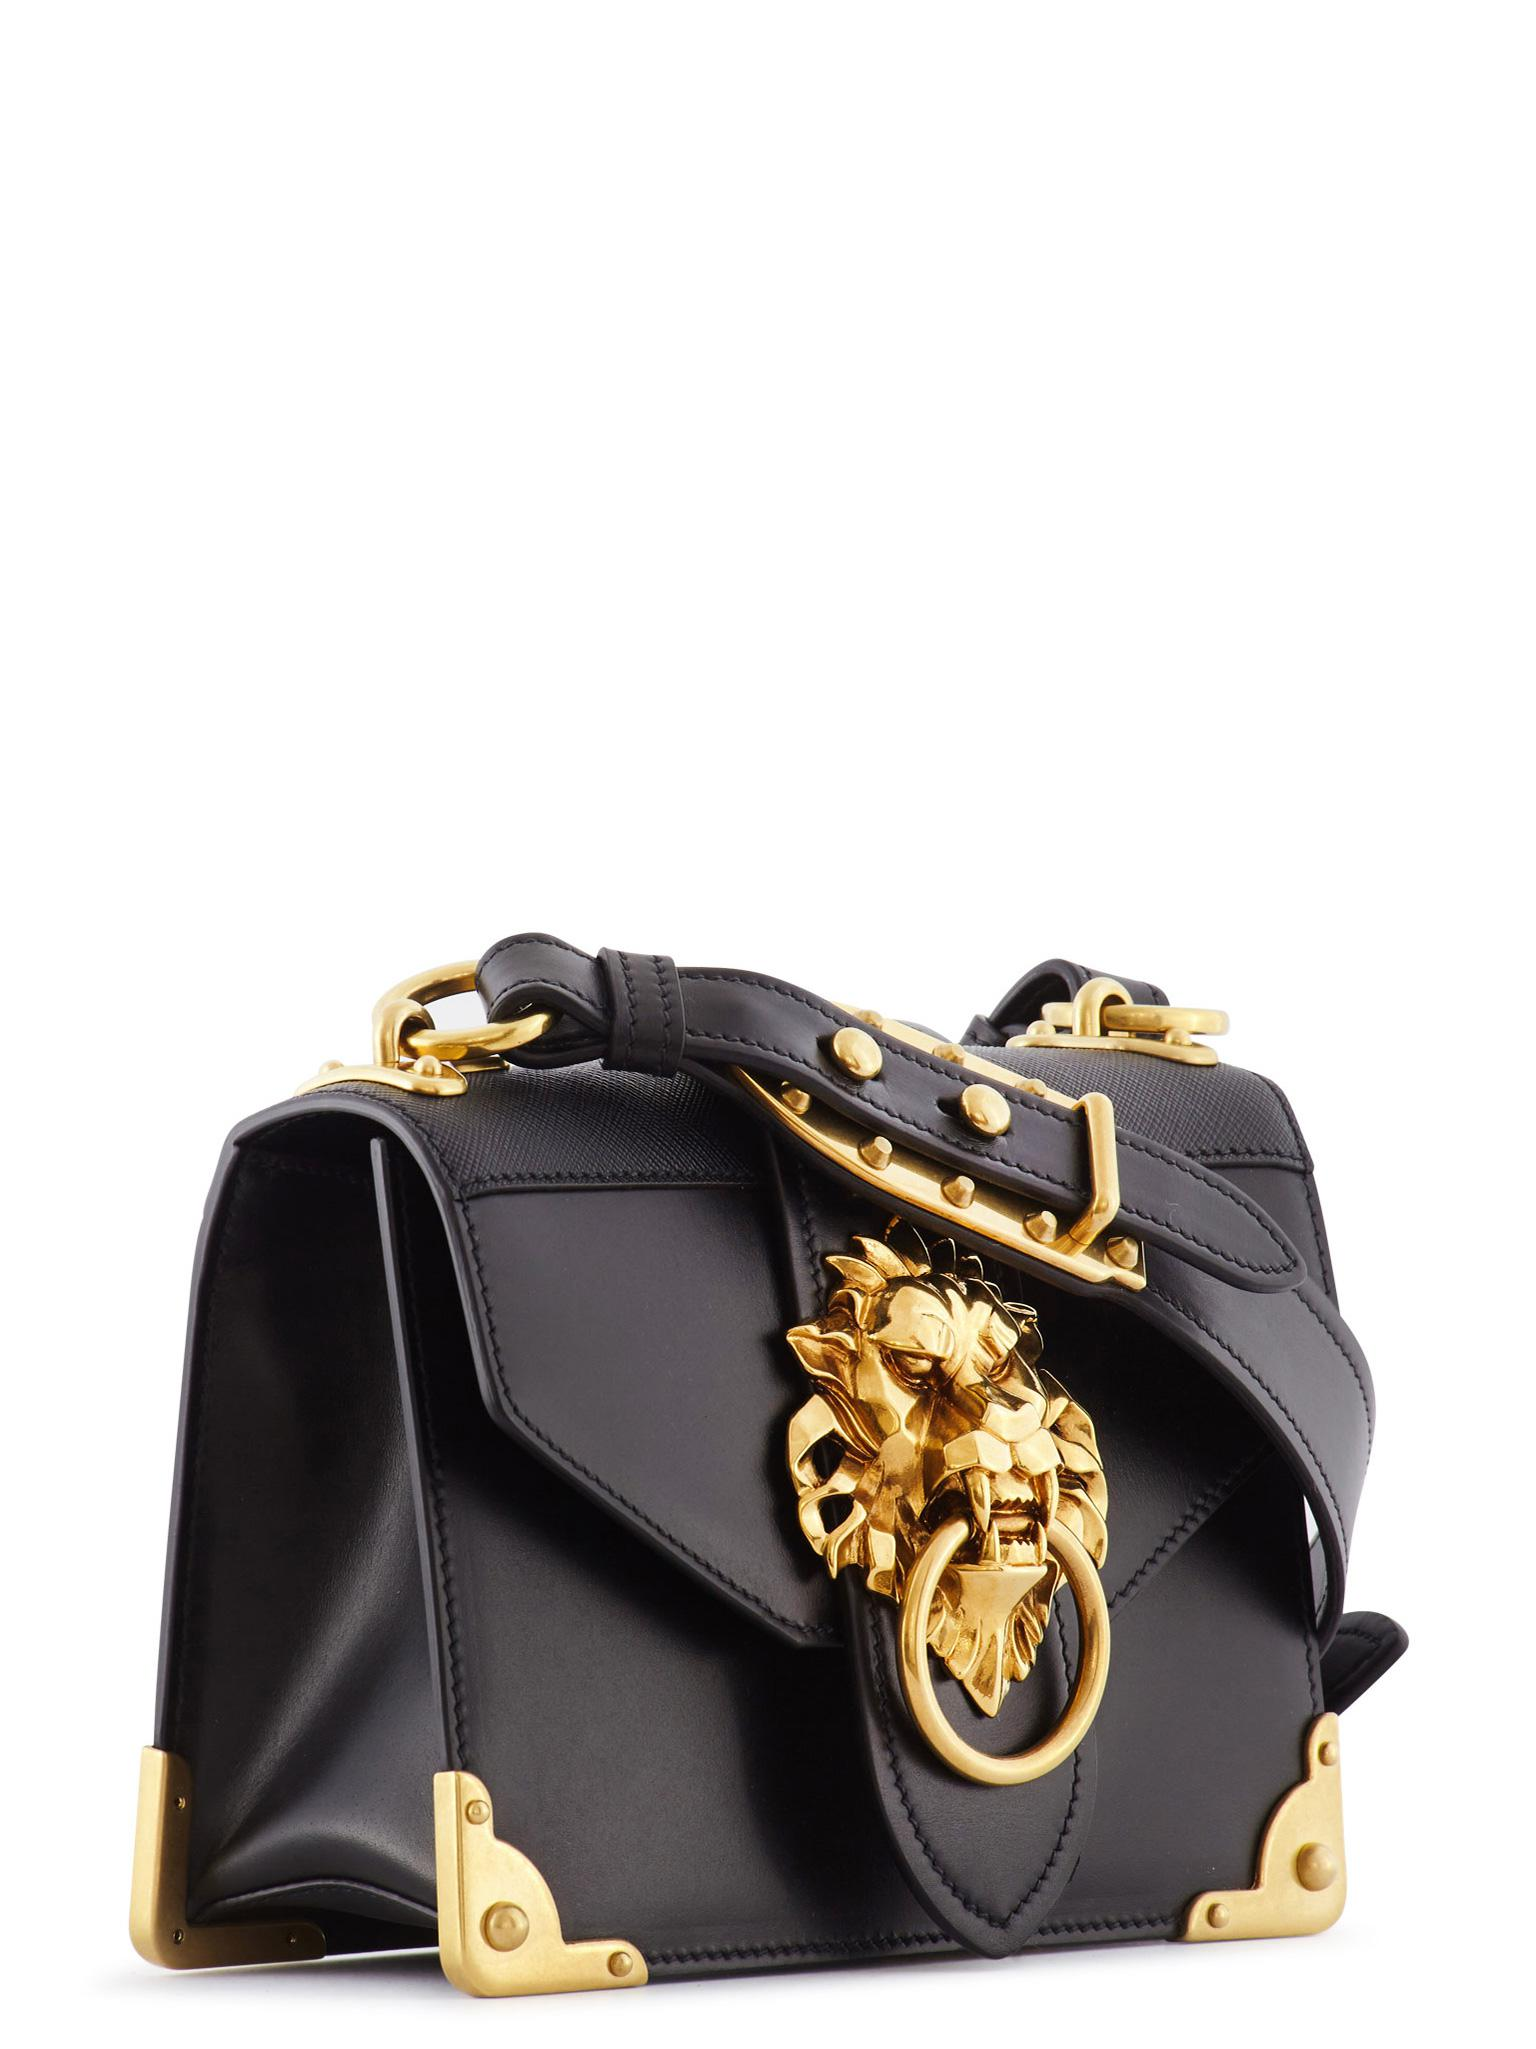 606342be3138 Prada Cahier Lion Head Leather Bag in Black - Lyst